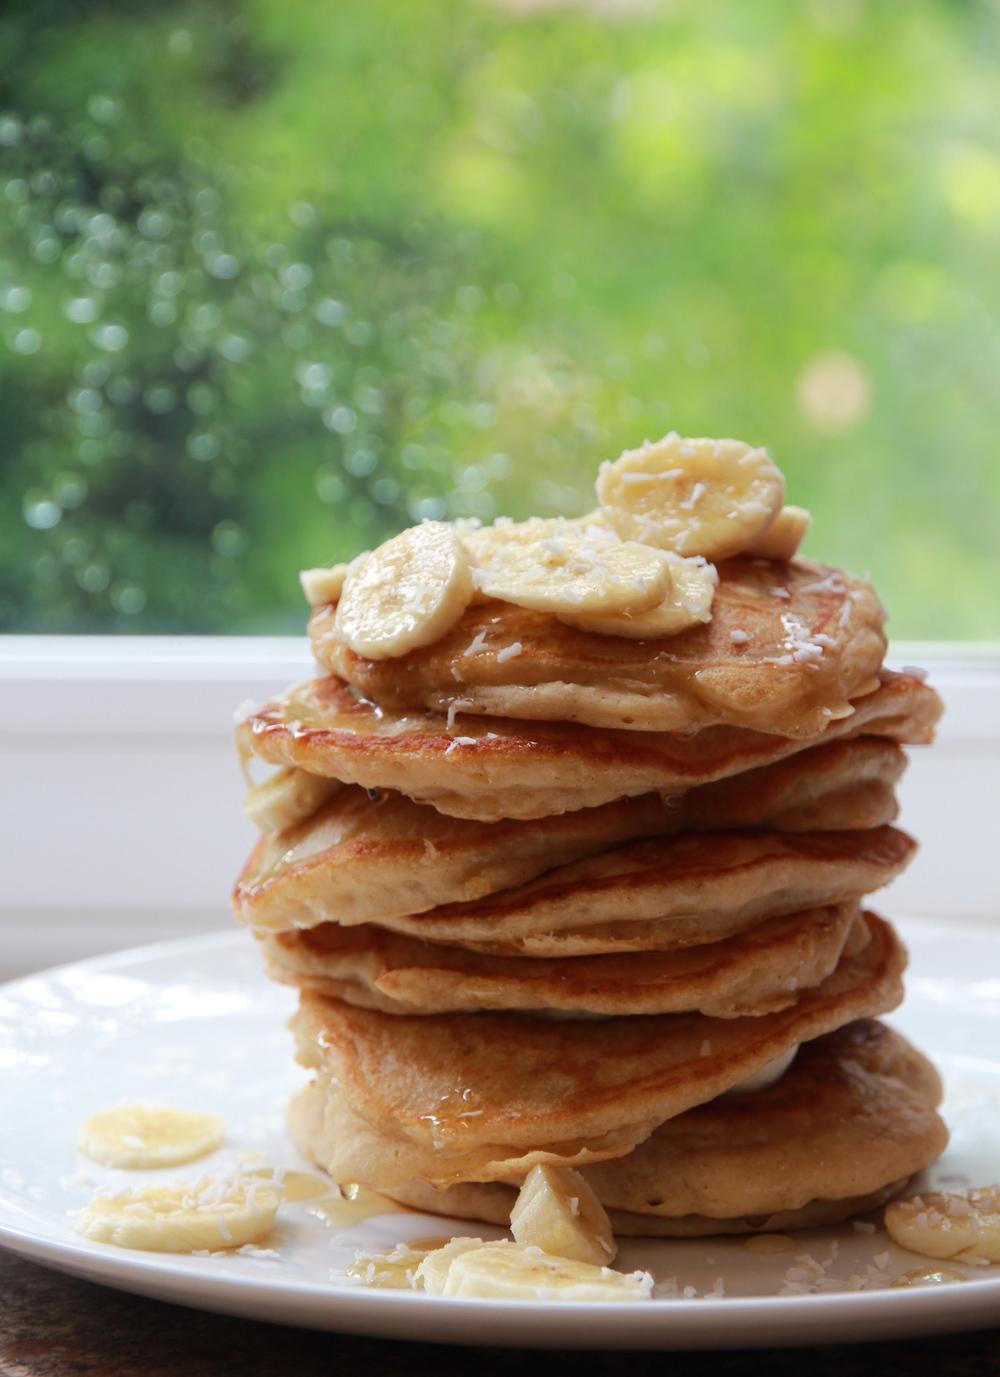 Banana & Coconut Pancakes